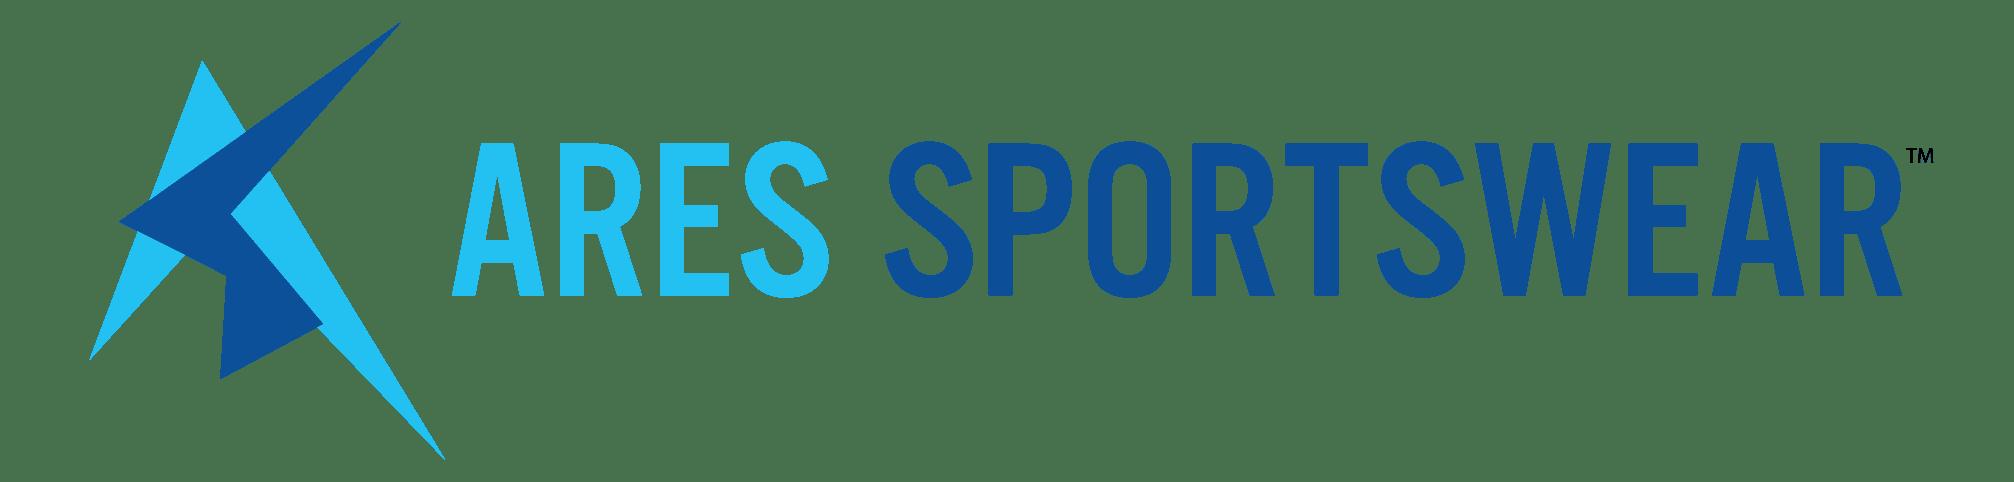 Ares Sportswear Logo